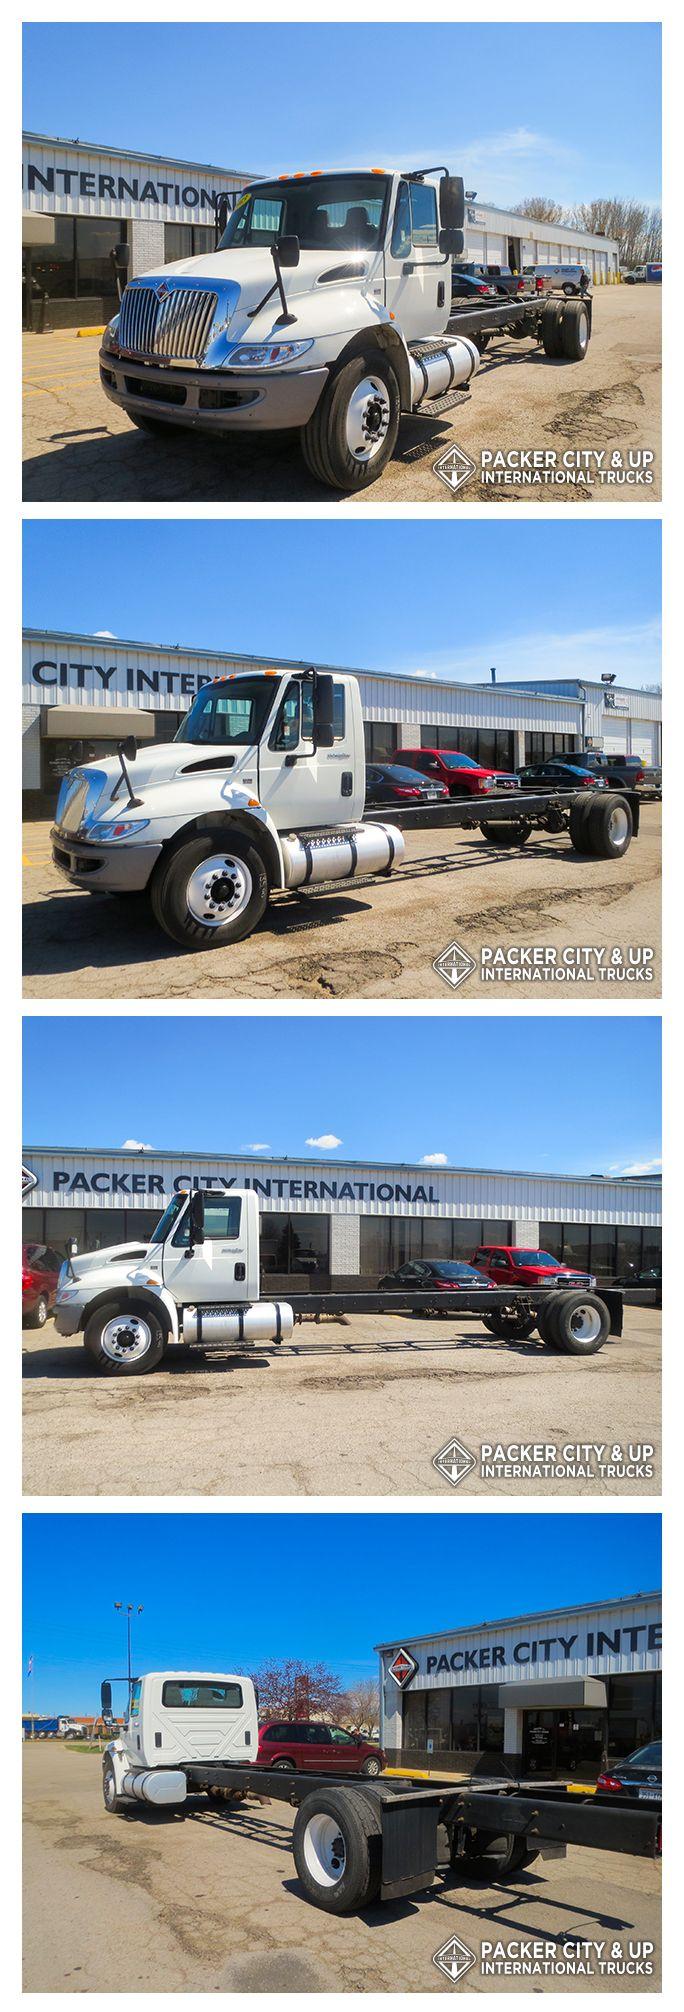 29 000 2012 international 4300 260 hp 6 speed manual 229k rh pinterest com Used International Trucks 4300 International 4300 Truck Accessories